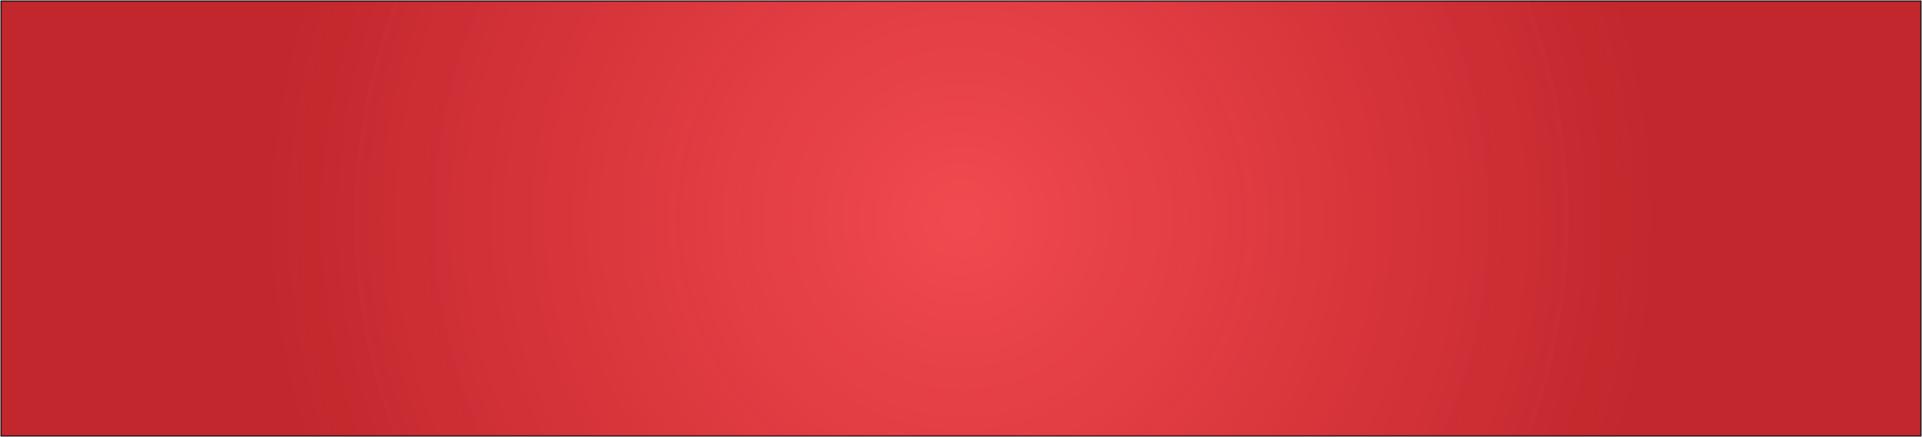 SLIDER_Red